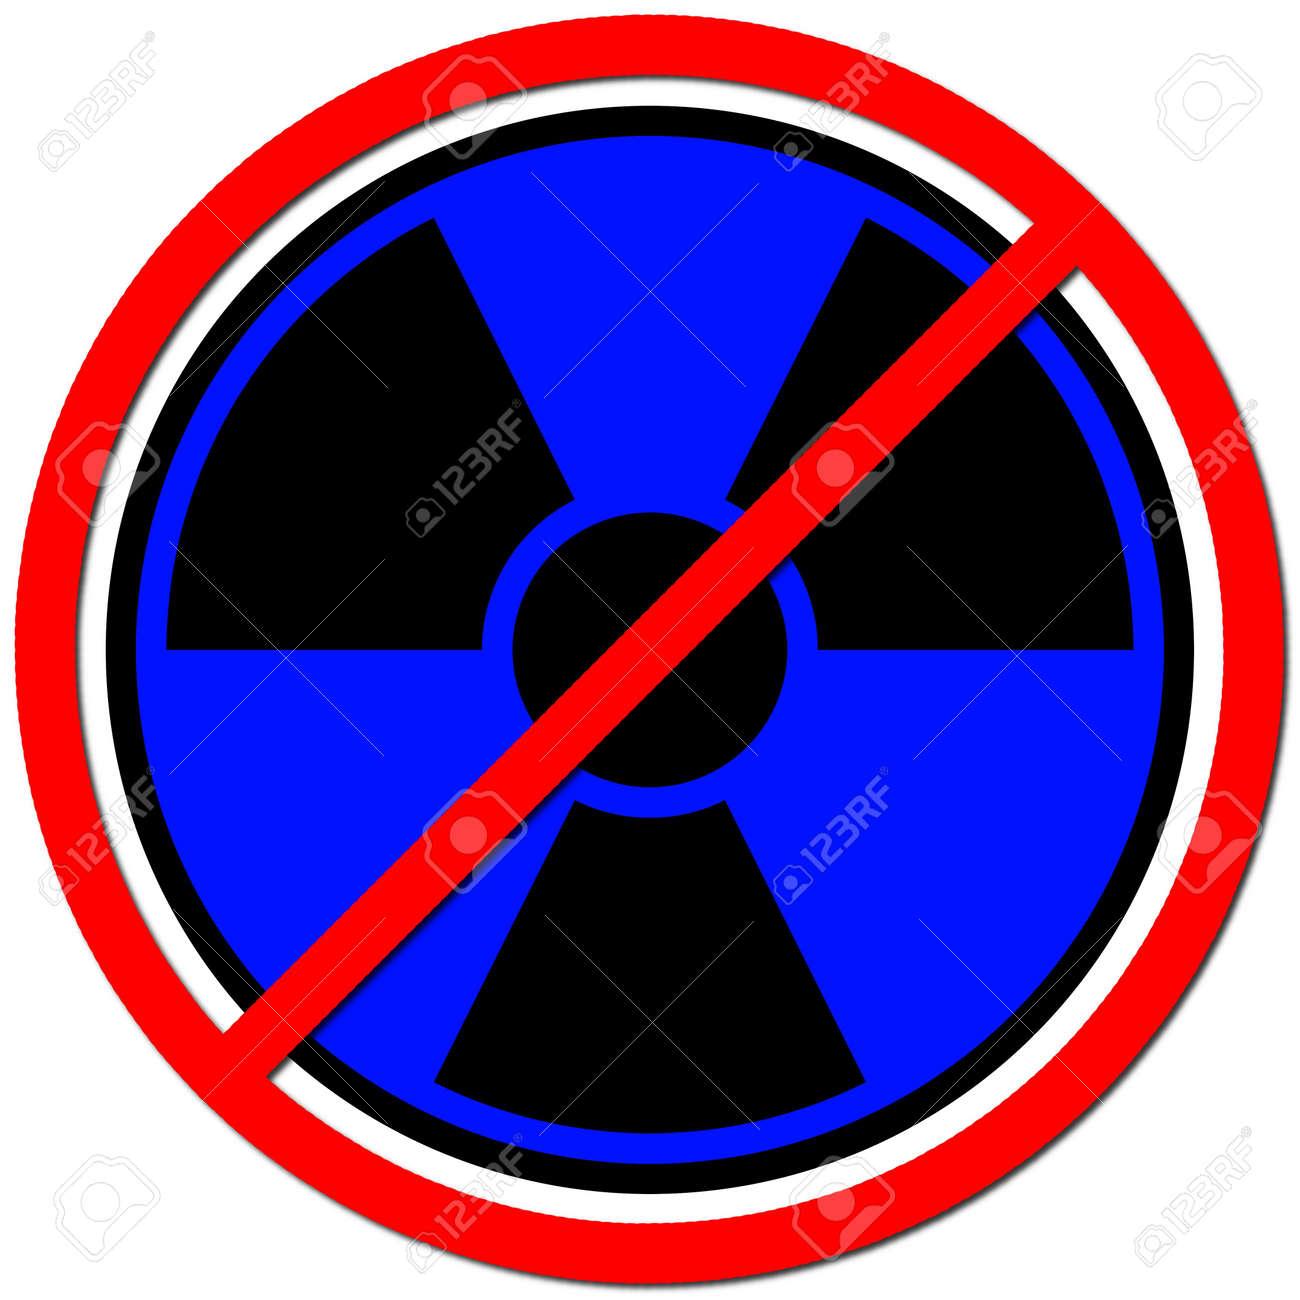 Blue sign against radiation on white background. Stock Photo - 5430162